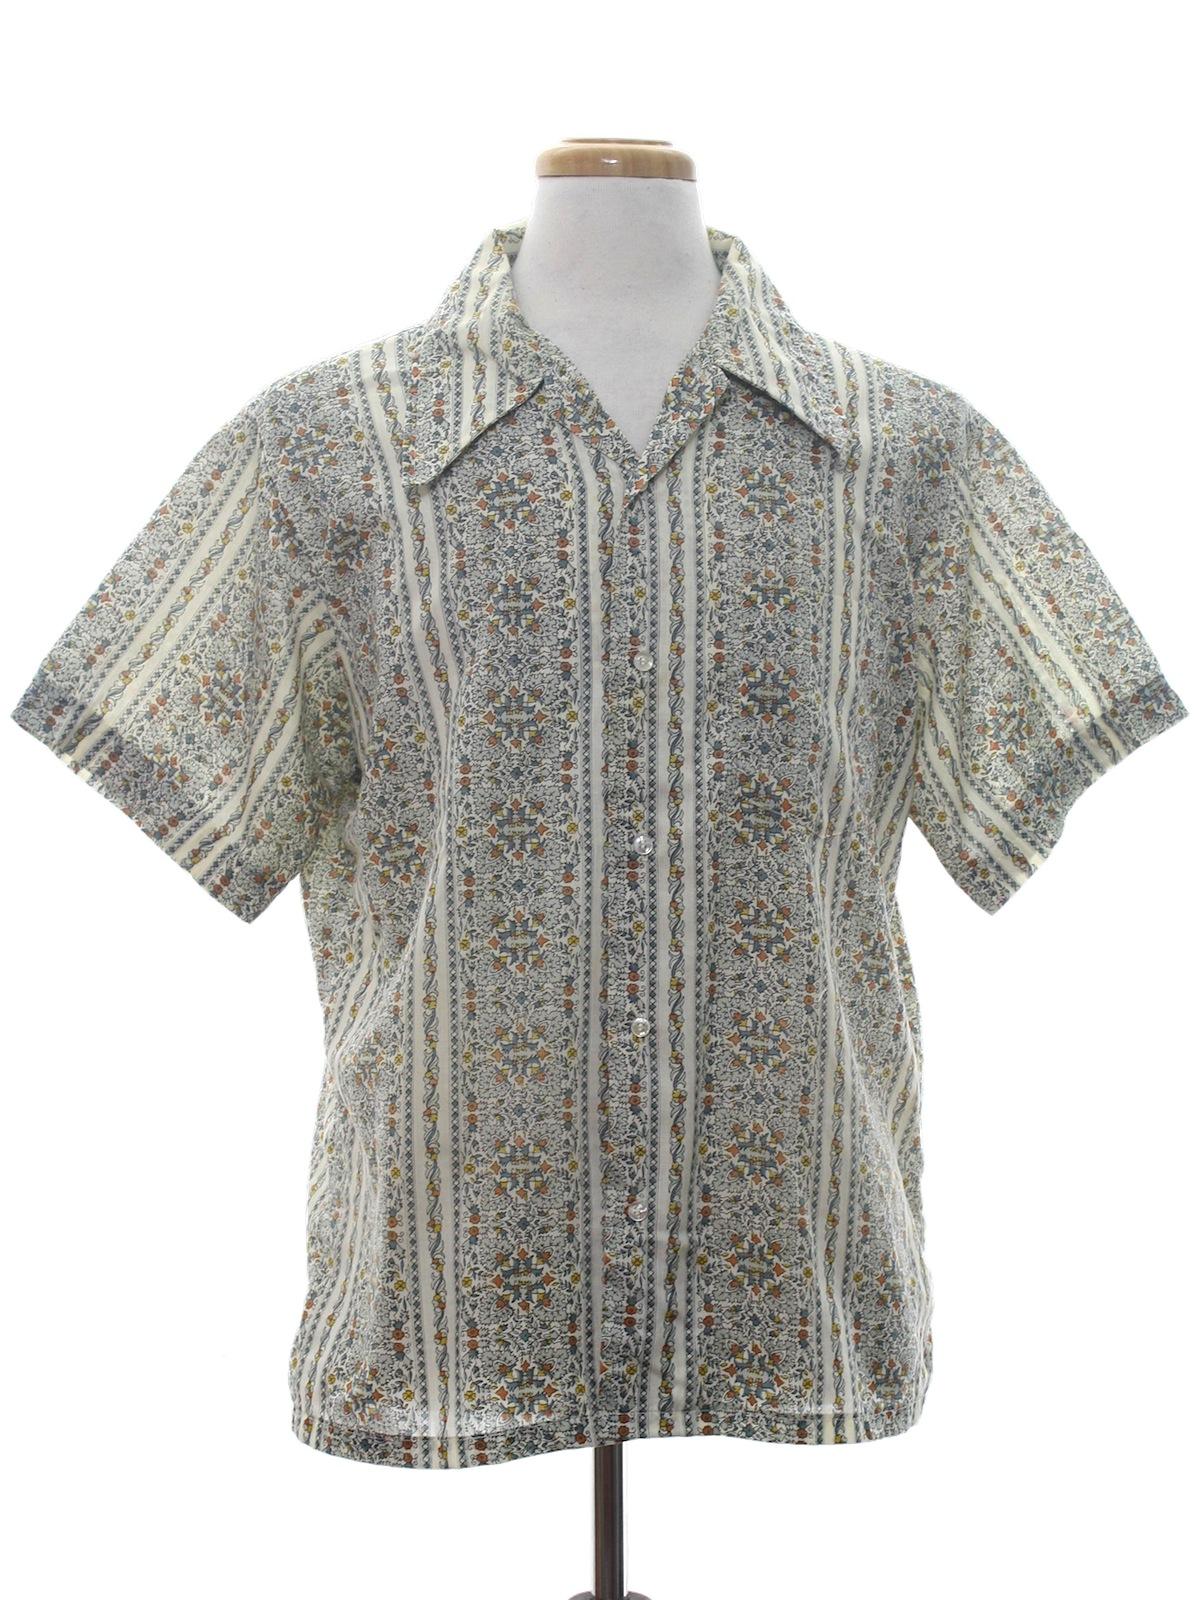 California seventies vintage shirt 70s california mens for Sports shirts near me